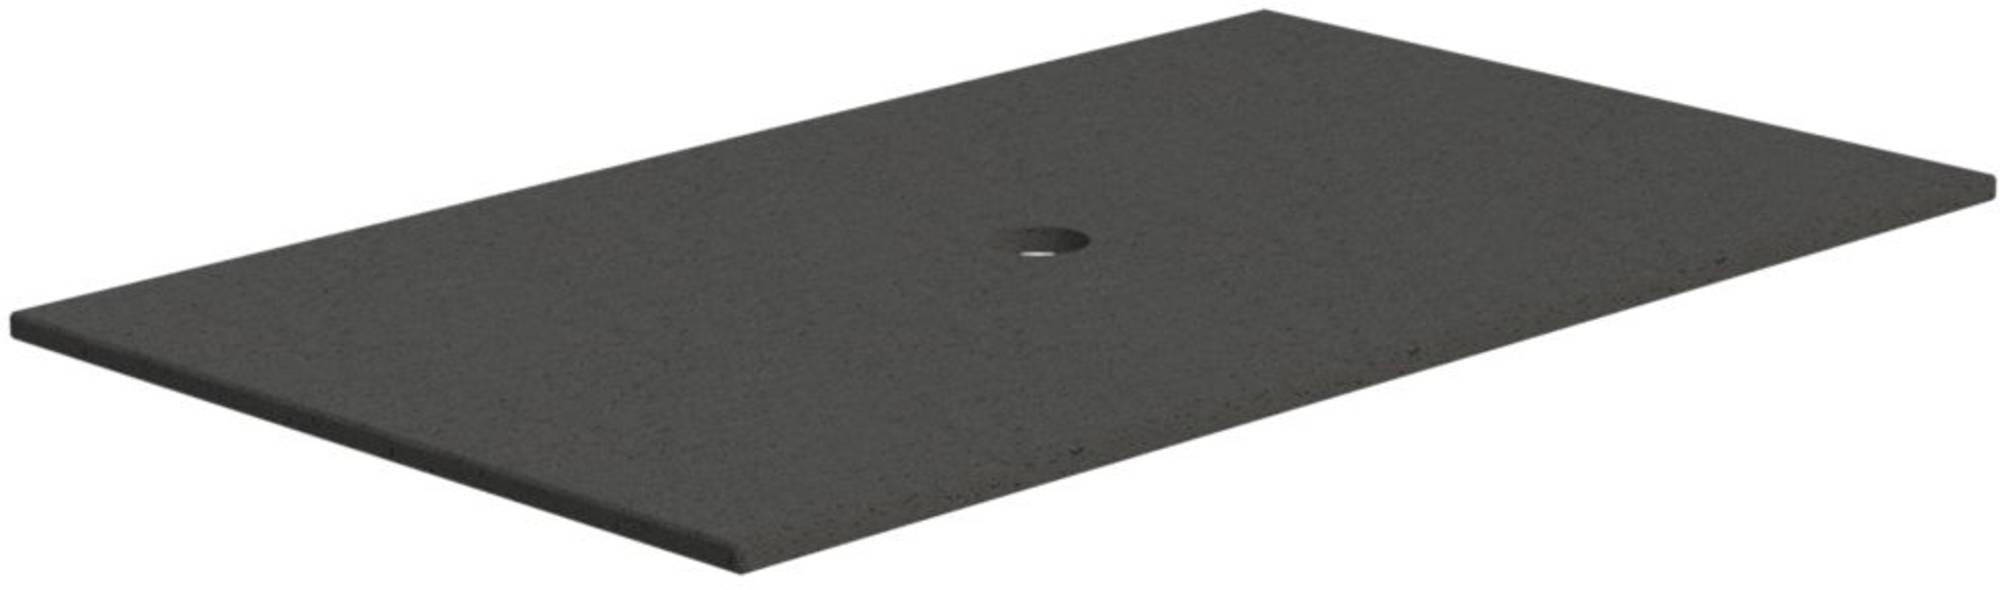 Thebalux Stone 1 Afdekblad Composiet 82x48,5x2 cm Cement Grigio Satin